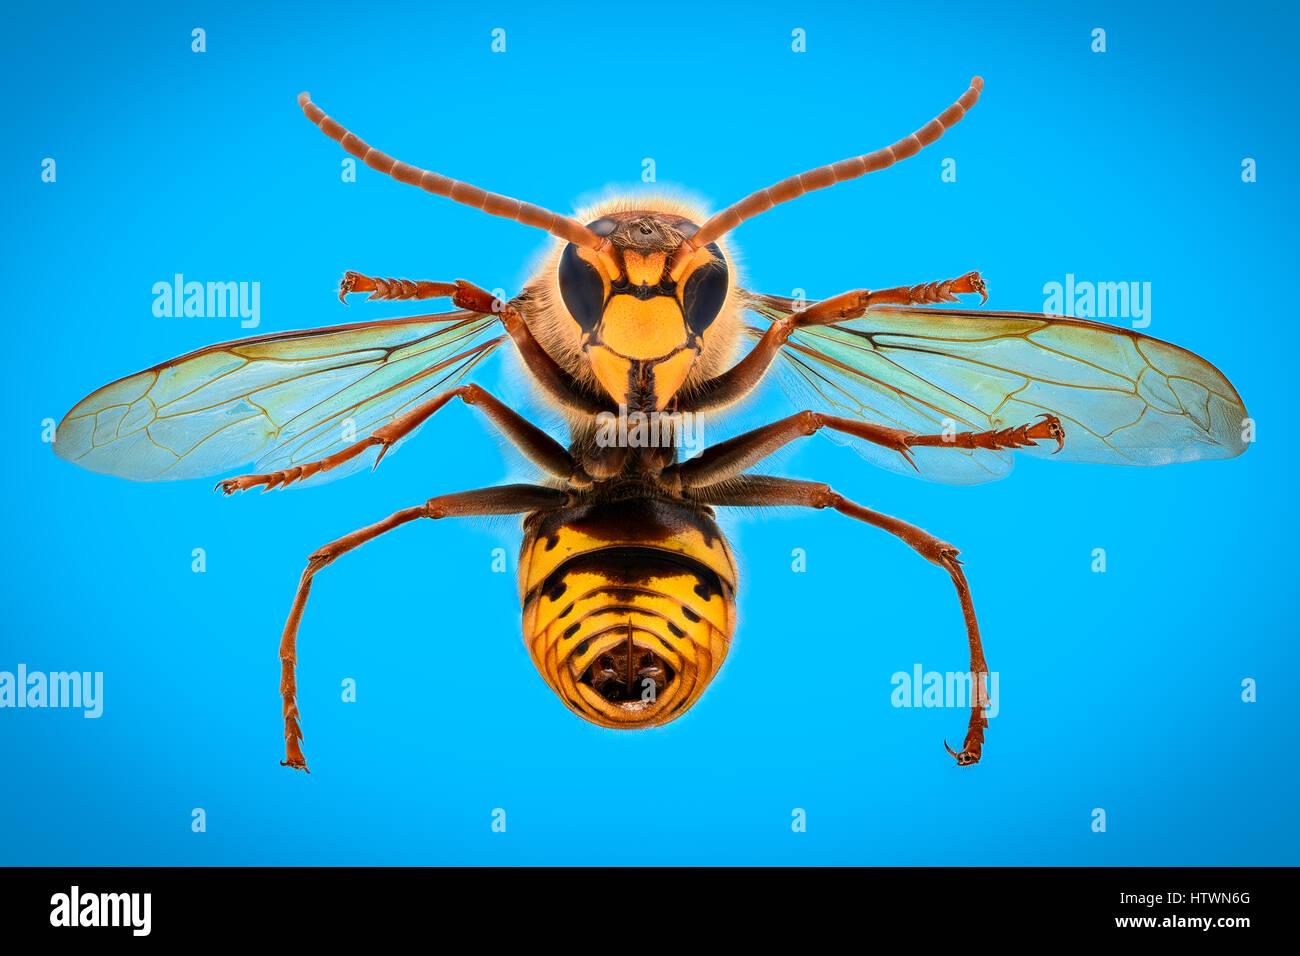 Extreme magnification - Giant Wasp anatomy - Stock Image